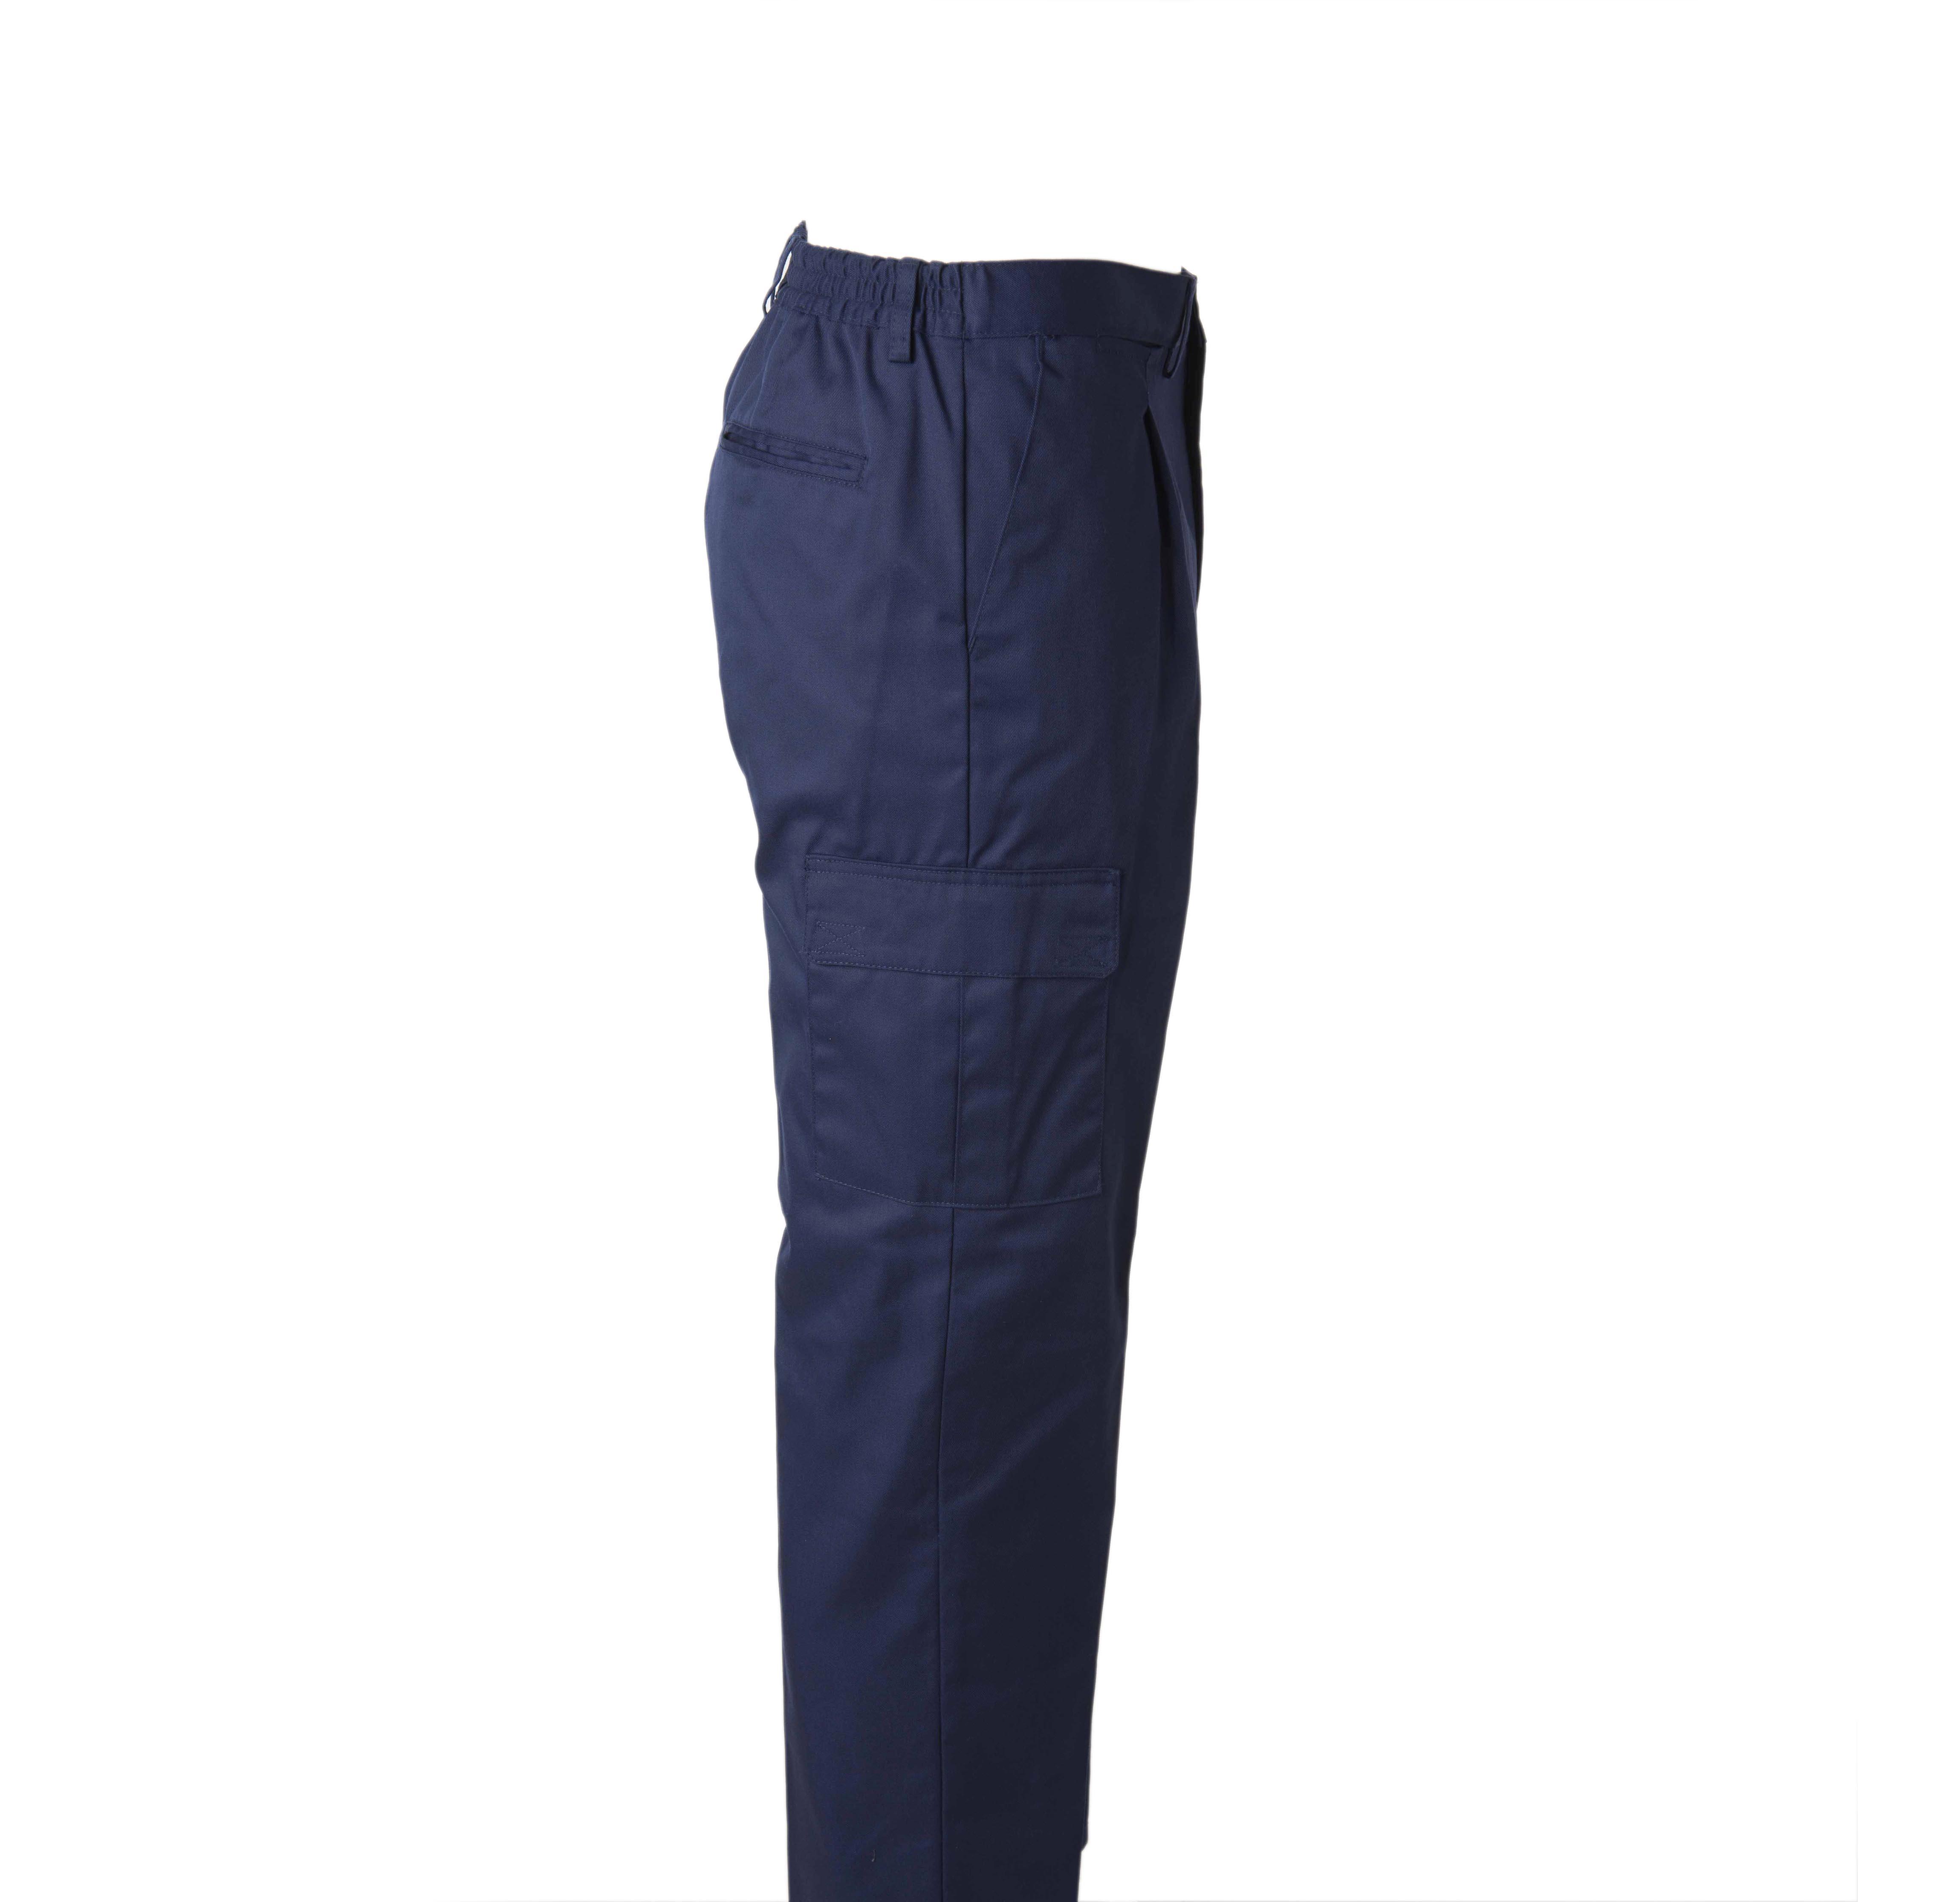 Pantalon Laboral Tka Extra Multibolsillos Con Elastico Trasero